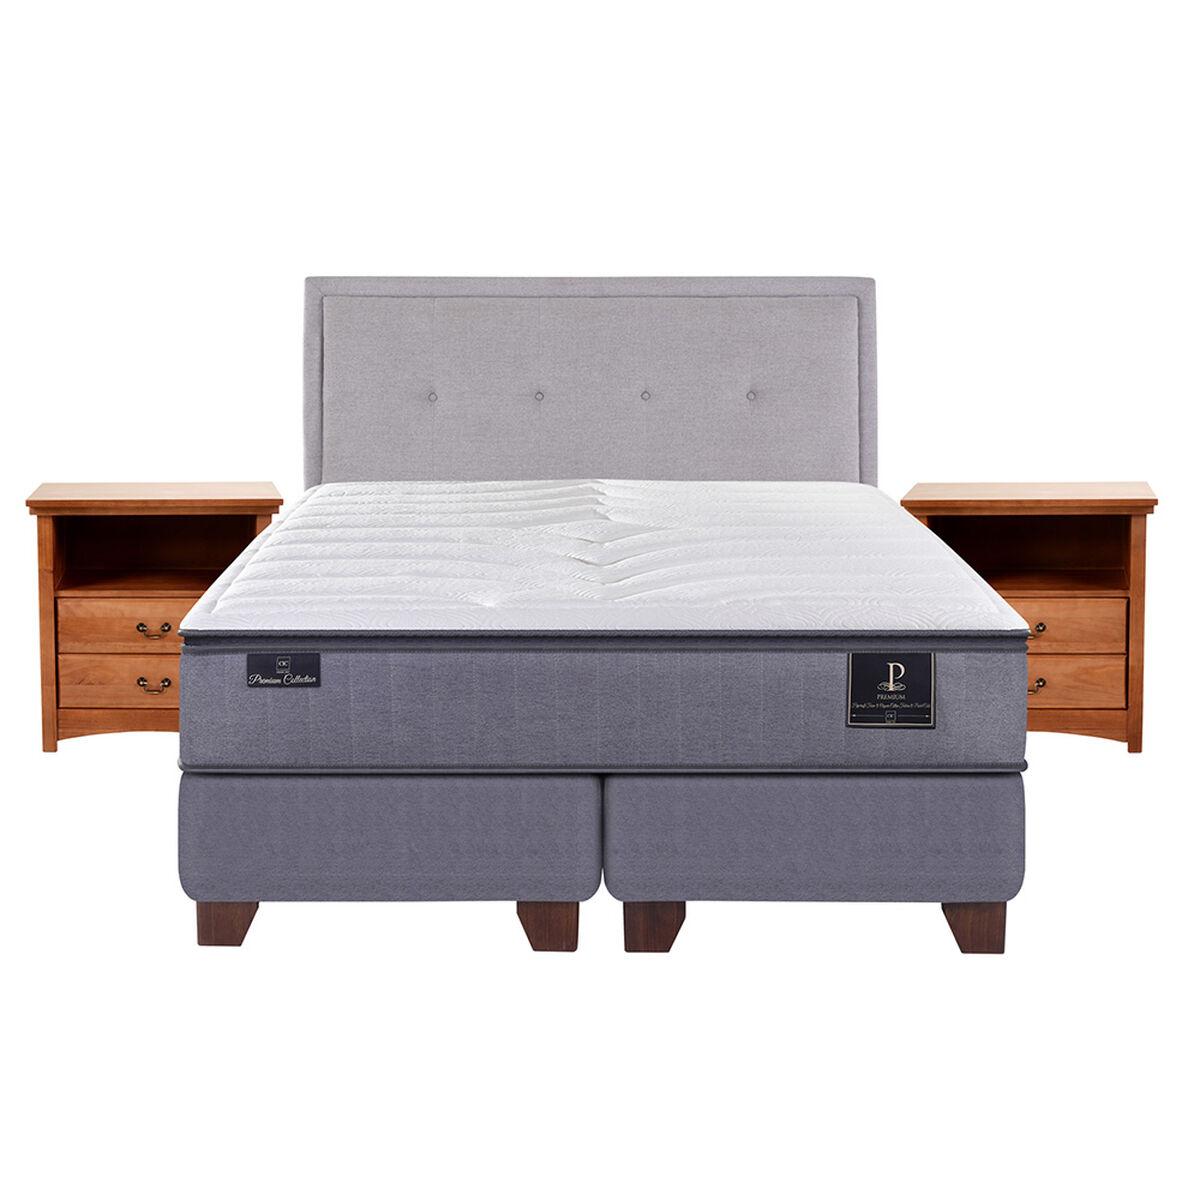 Box Spring Premium 2 Plazas Base Dividida + Mueble + Respaldo Ganges